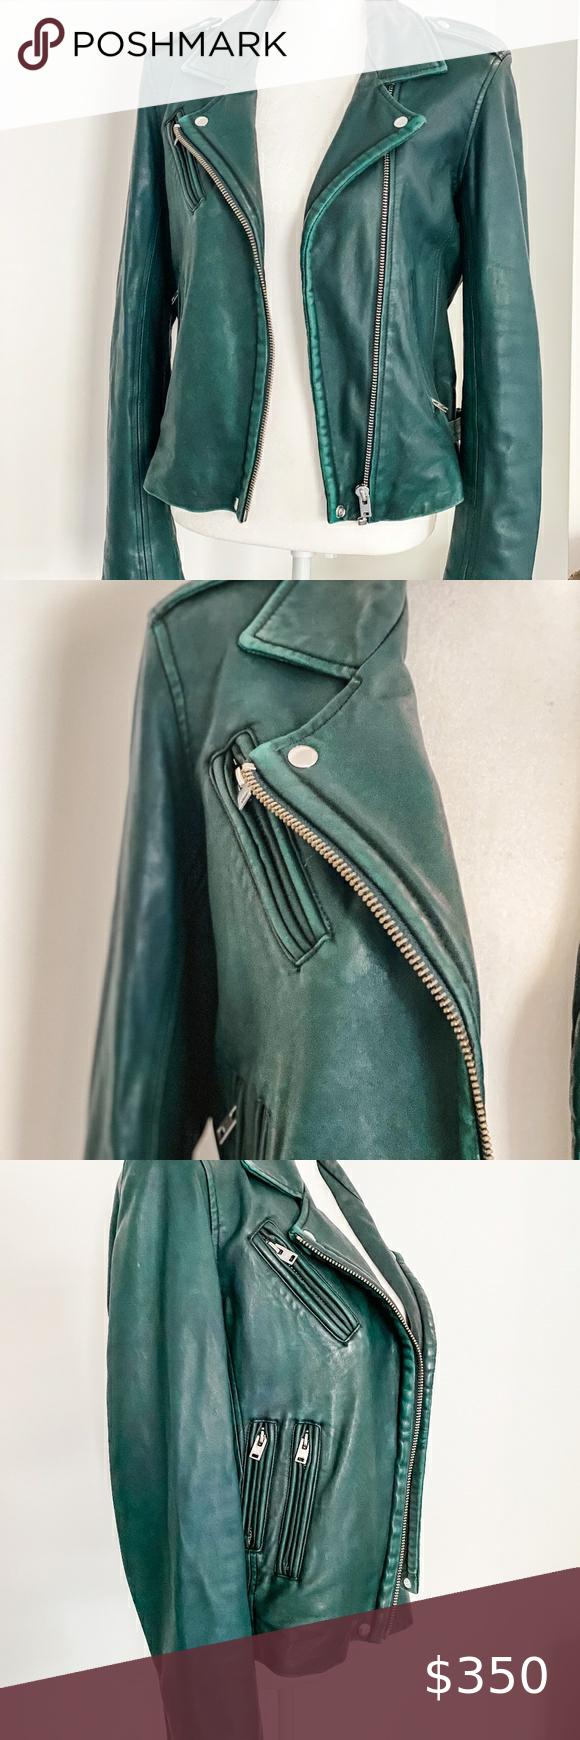 Price Drop Iro Han Leather Moto Jacket Leather Moto Jacket Moto Jacket Leather Moto [ 1740 x 580 Pixel ]